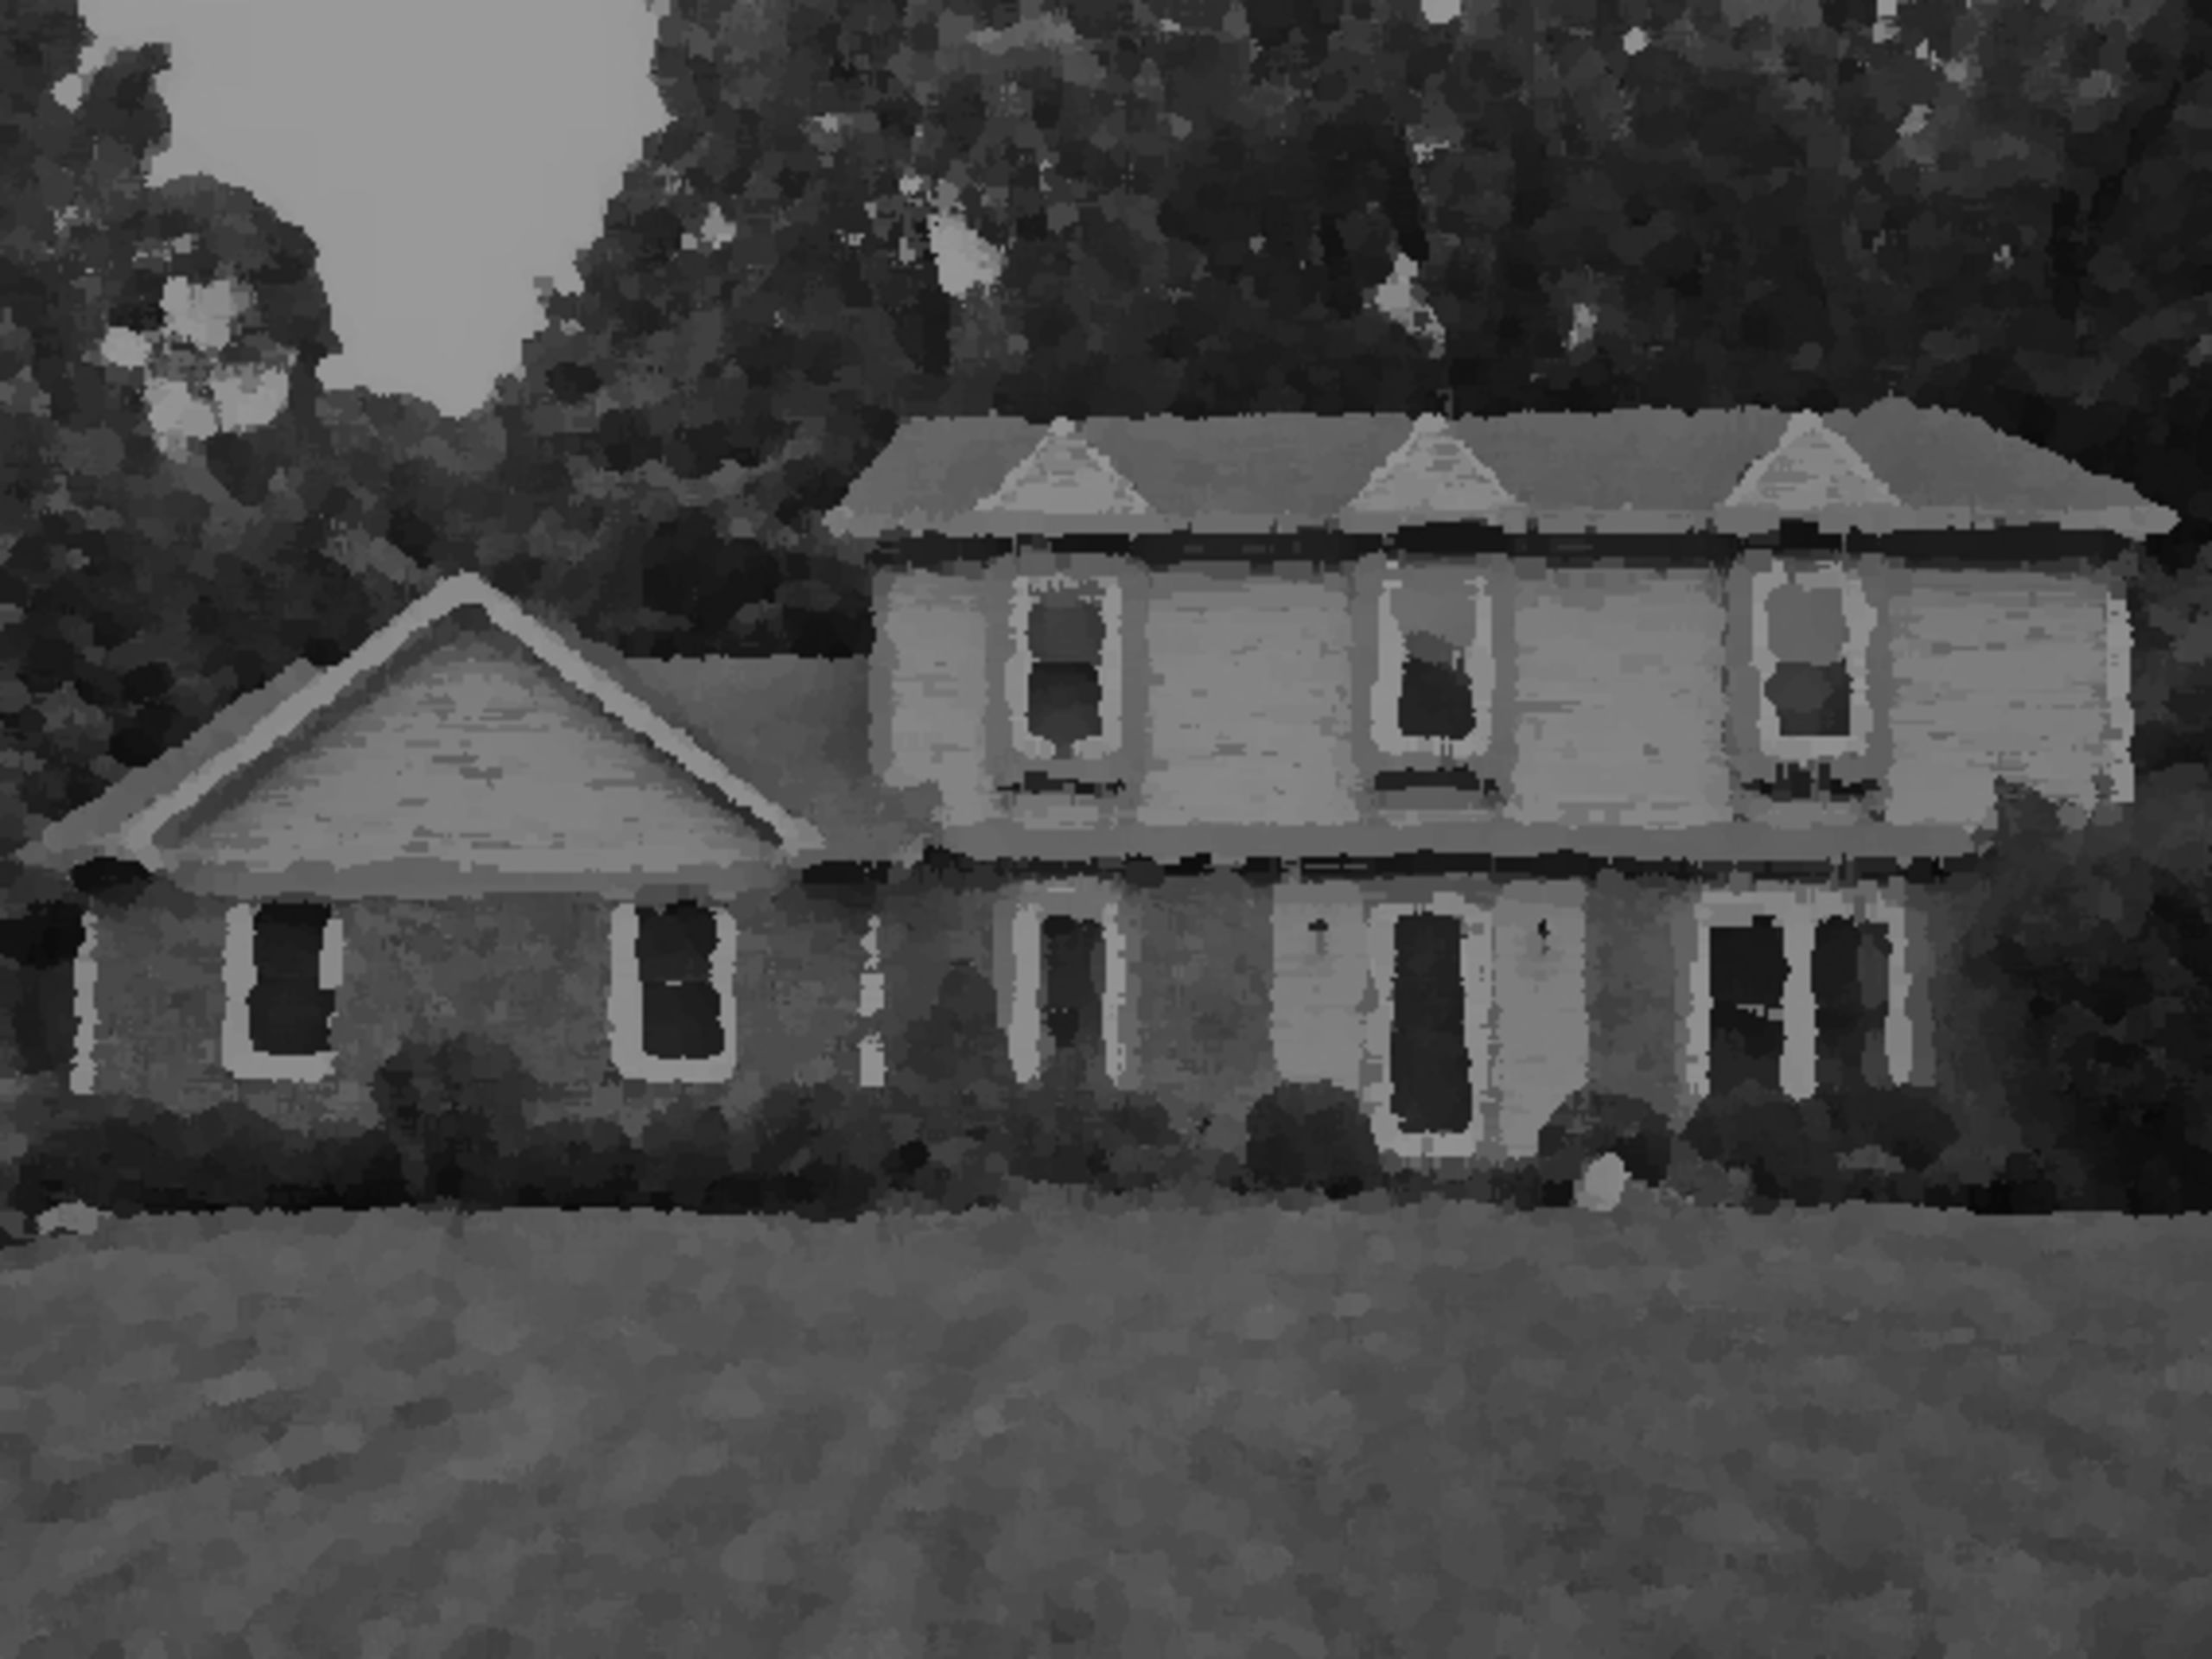 NEIGHBORHOOD SPOTLIGHT: the Wellingtons in Noblesville